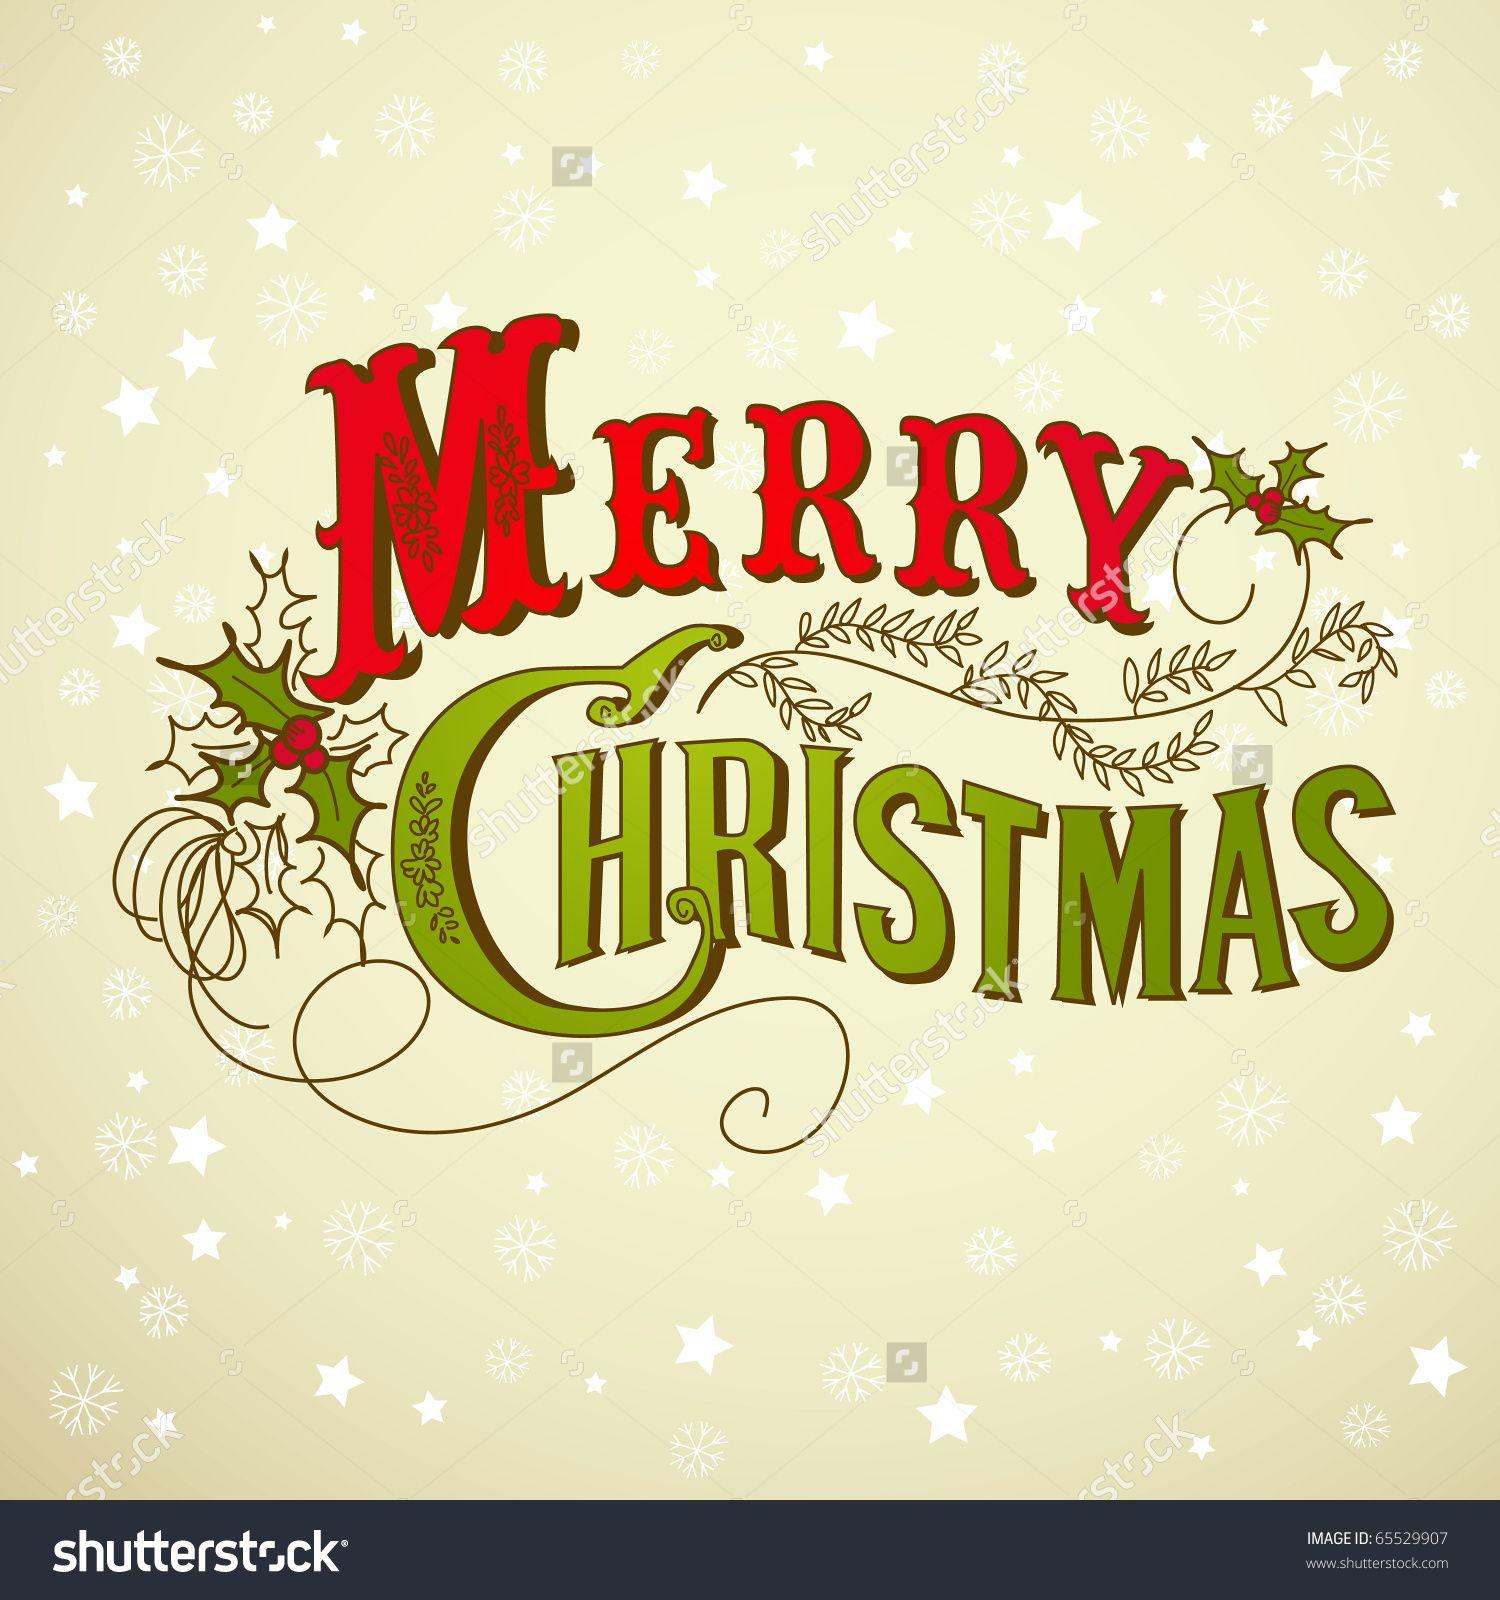 Vintage christmas card merry christmas lettering stock vector vintage christmas card merry christmas lettering stock vector illustration 65529907 shutterstock kristyandbryce Gallery